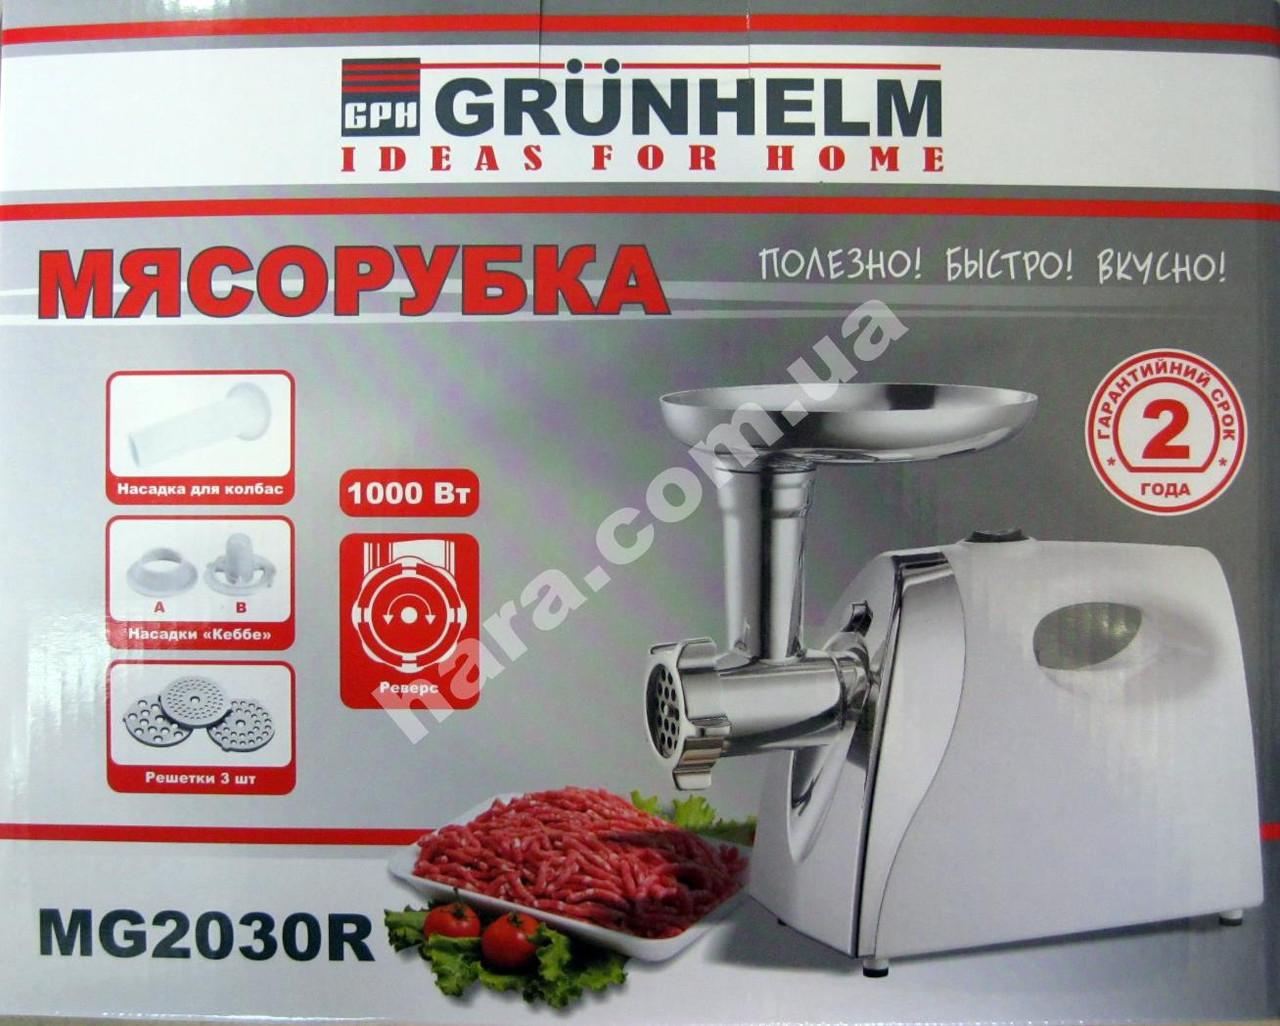 Мясорубка GRUNHELM (1000 Вт)